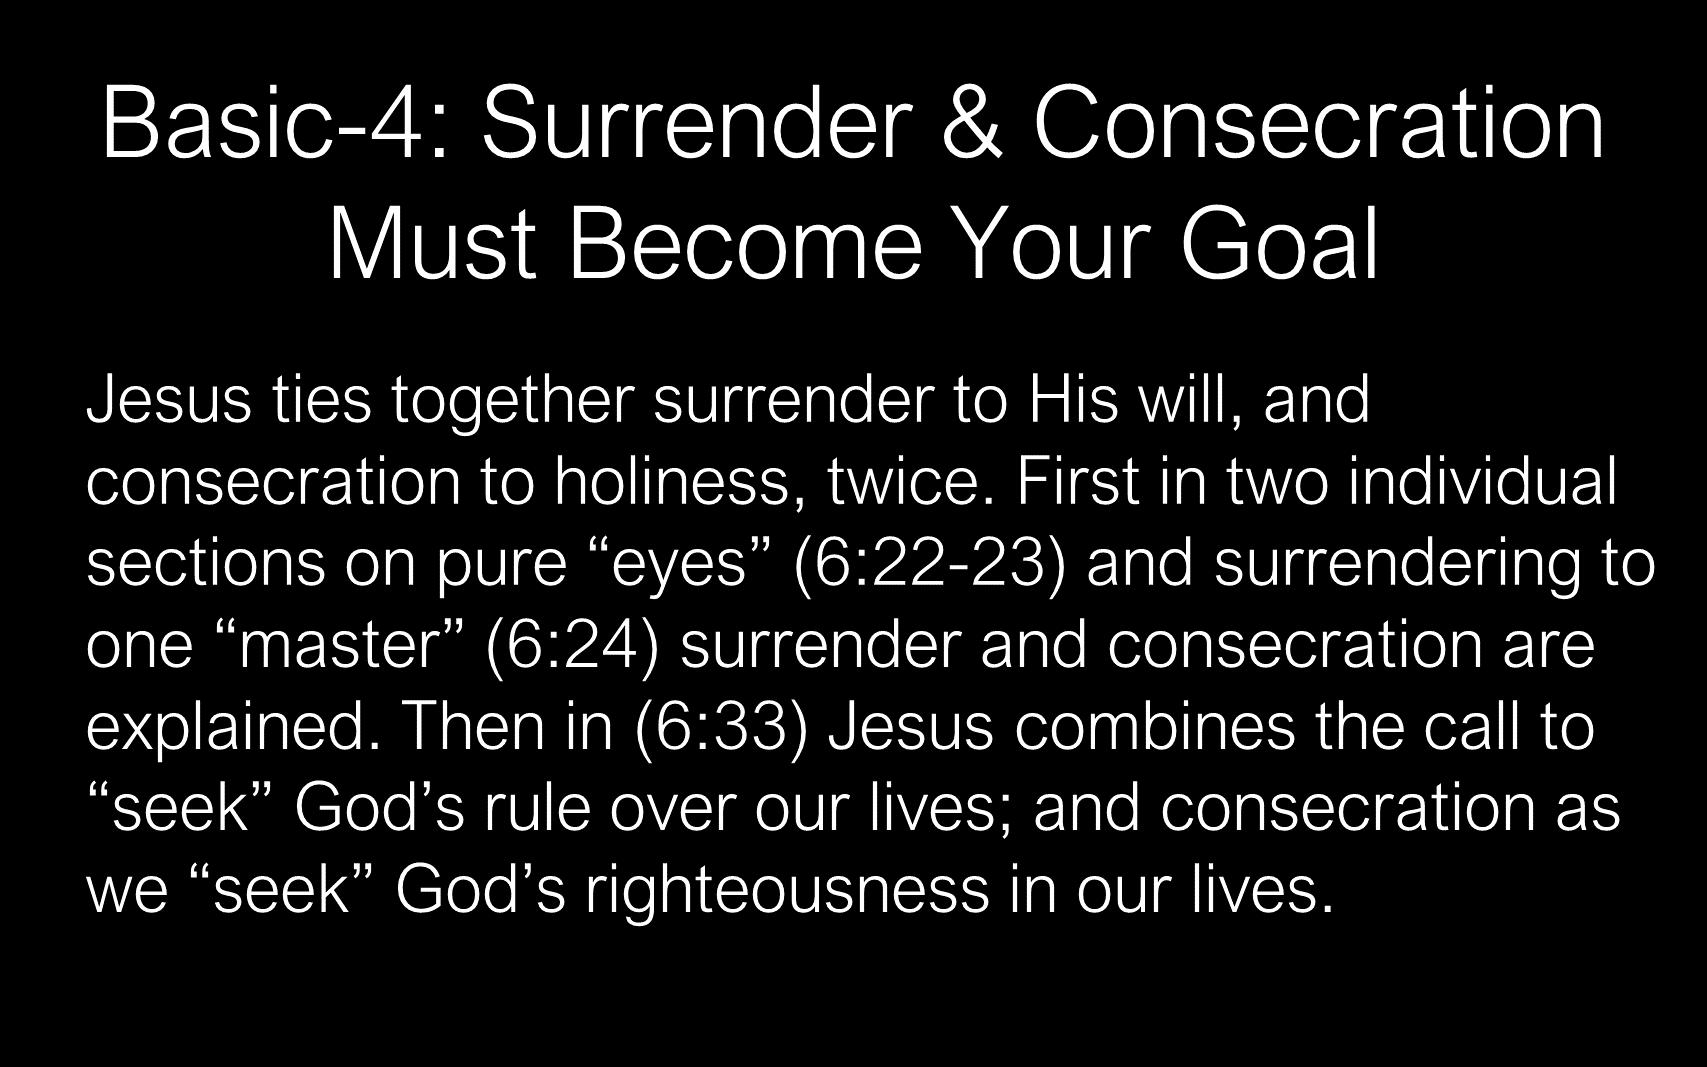 The Discipline Of Disciple-Making - Disciples - Follow